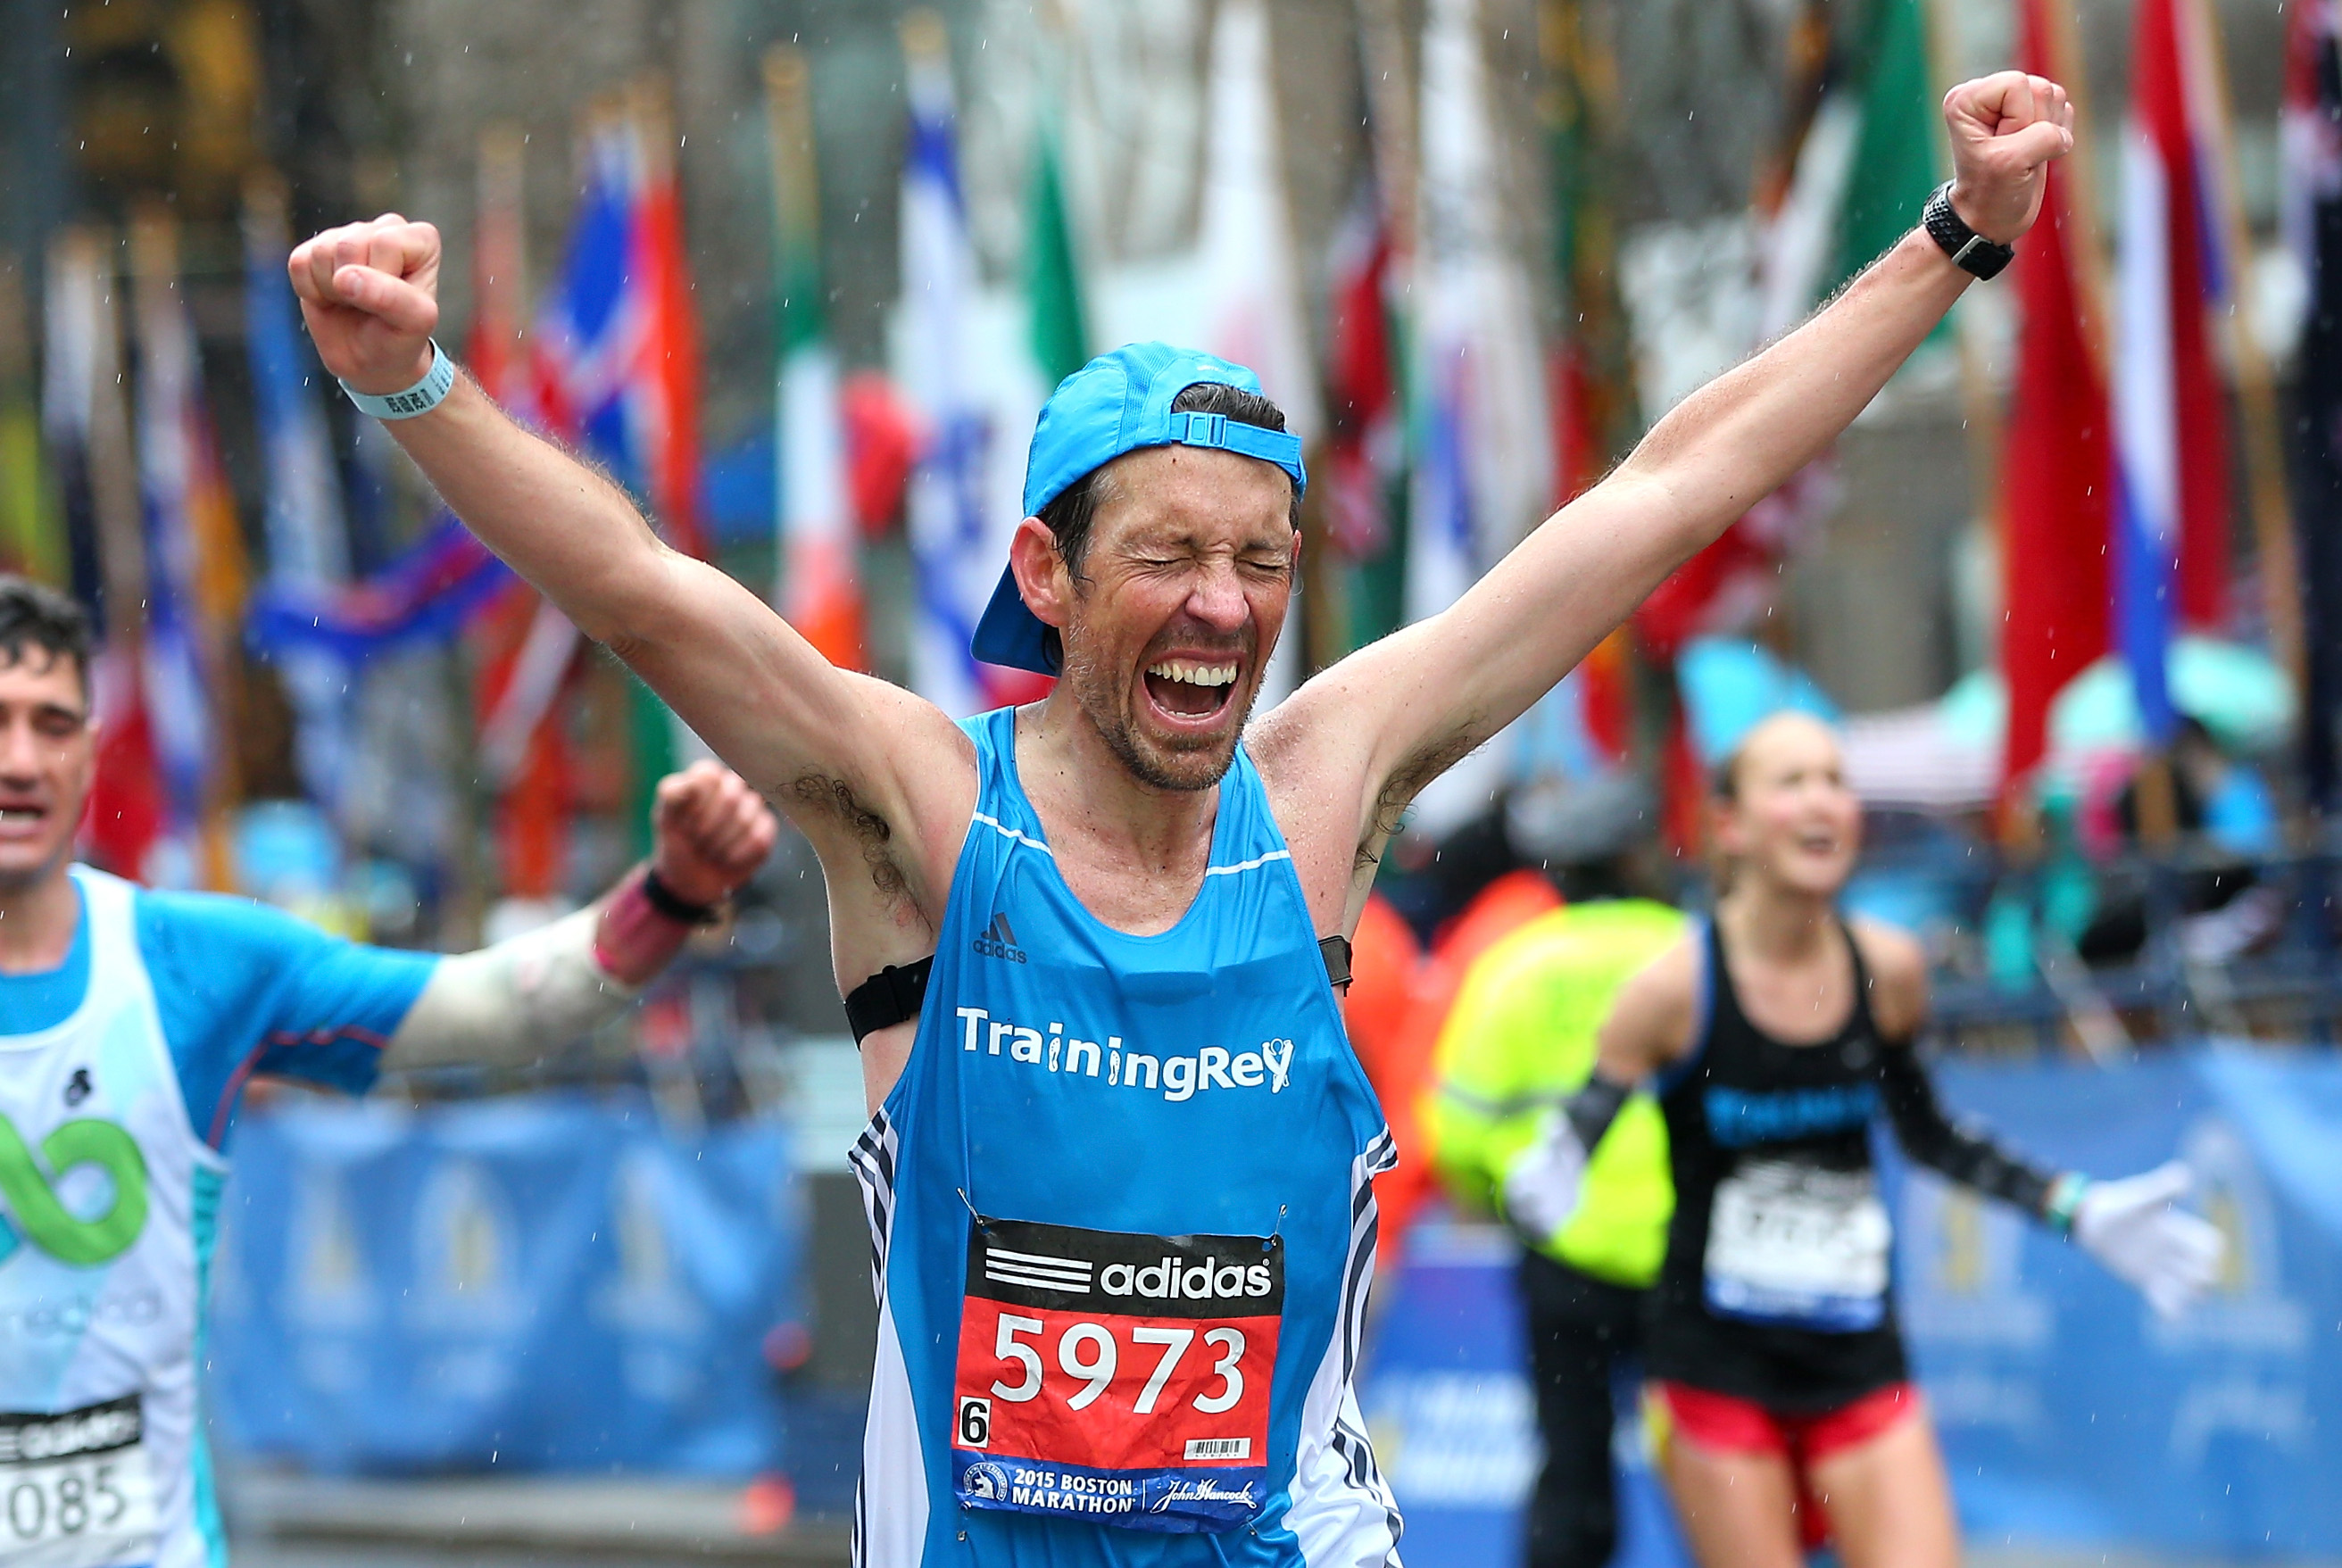 Boston marathon, Boston marathon 2016, boston marathon start time, boston marathon day, boston marathon womens race start,boston marathon race channel, boston marathon mens start, boston marathon wheelchair start, when boston marathon start,